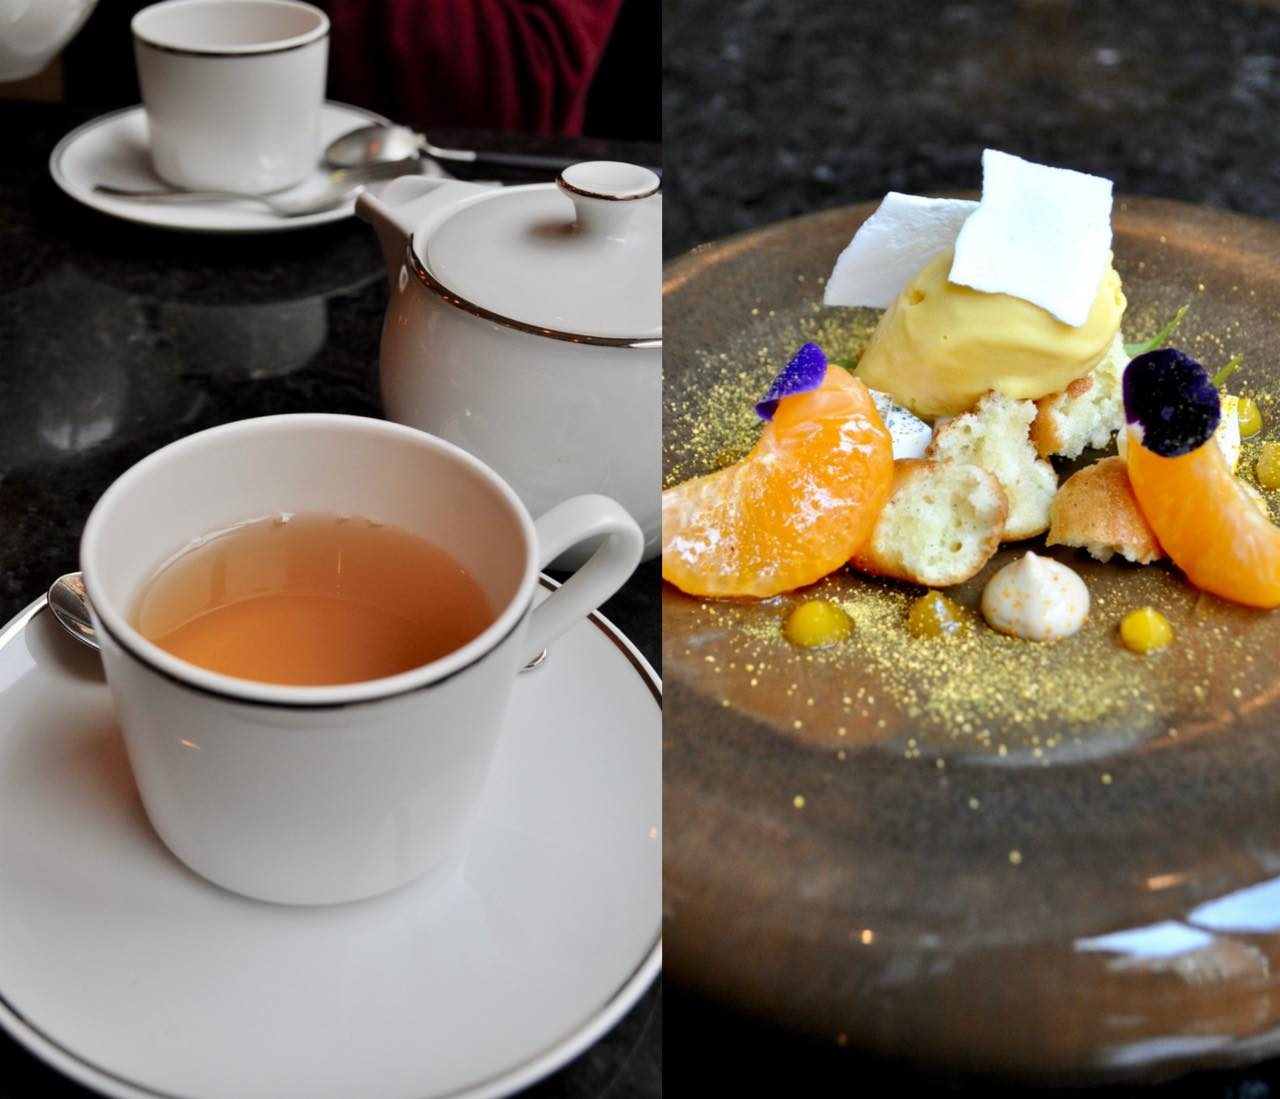 Mandarin, madeleine, clove